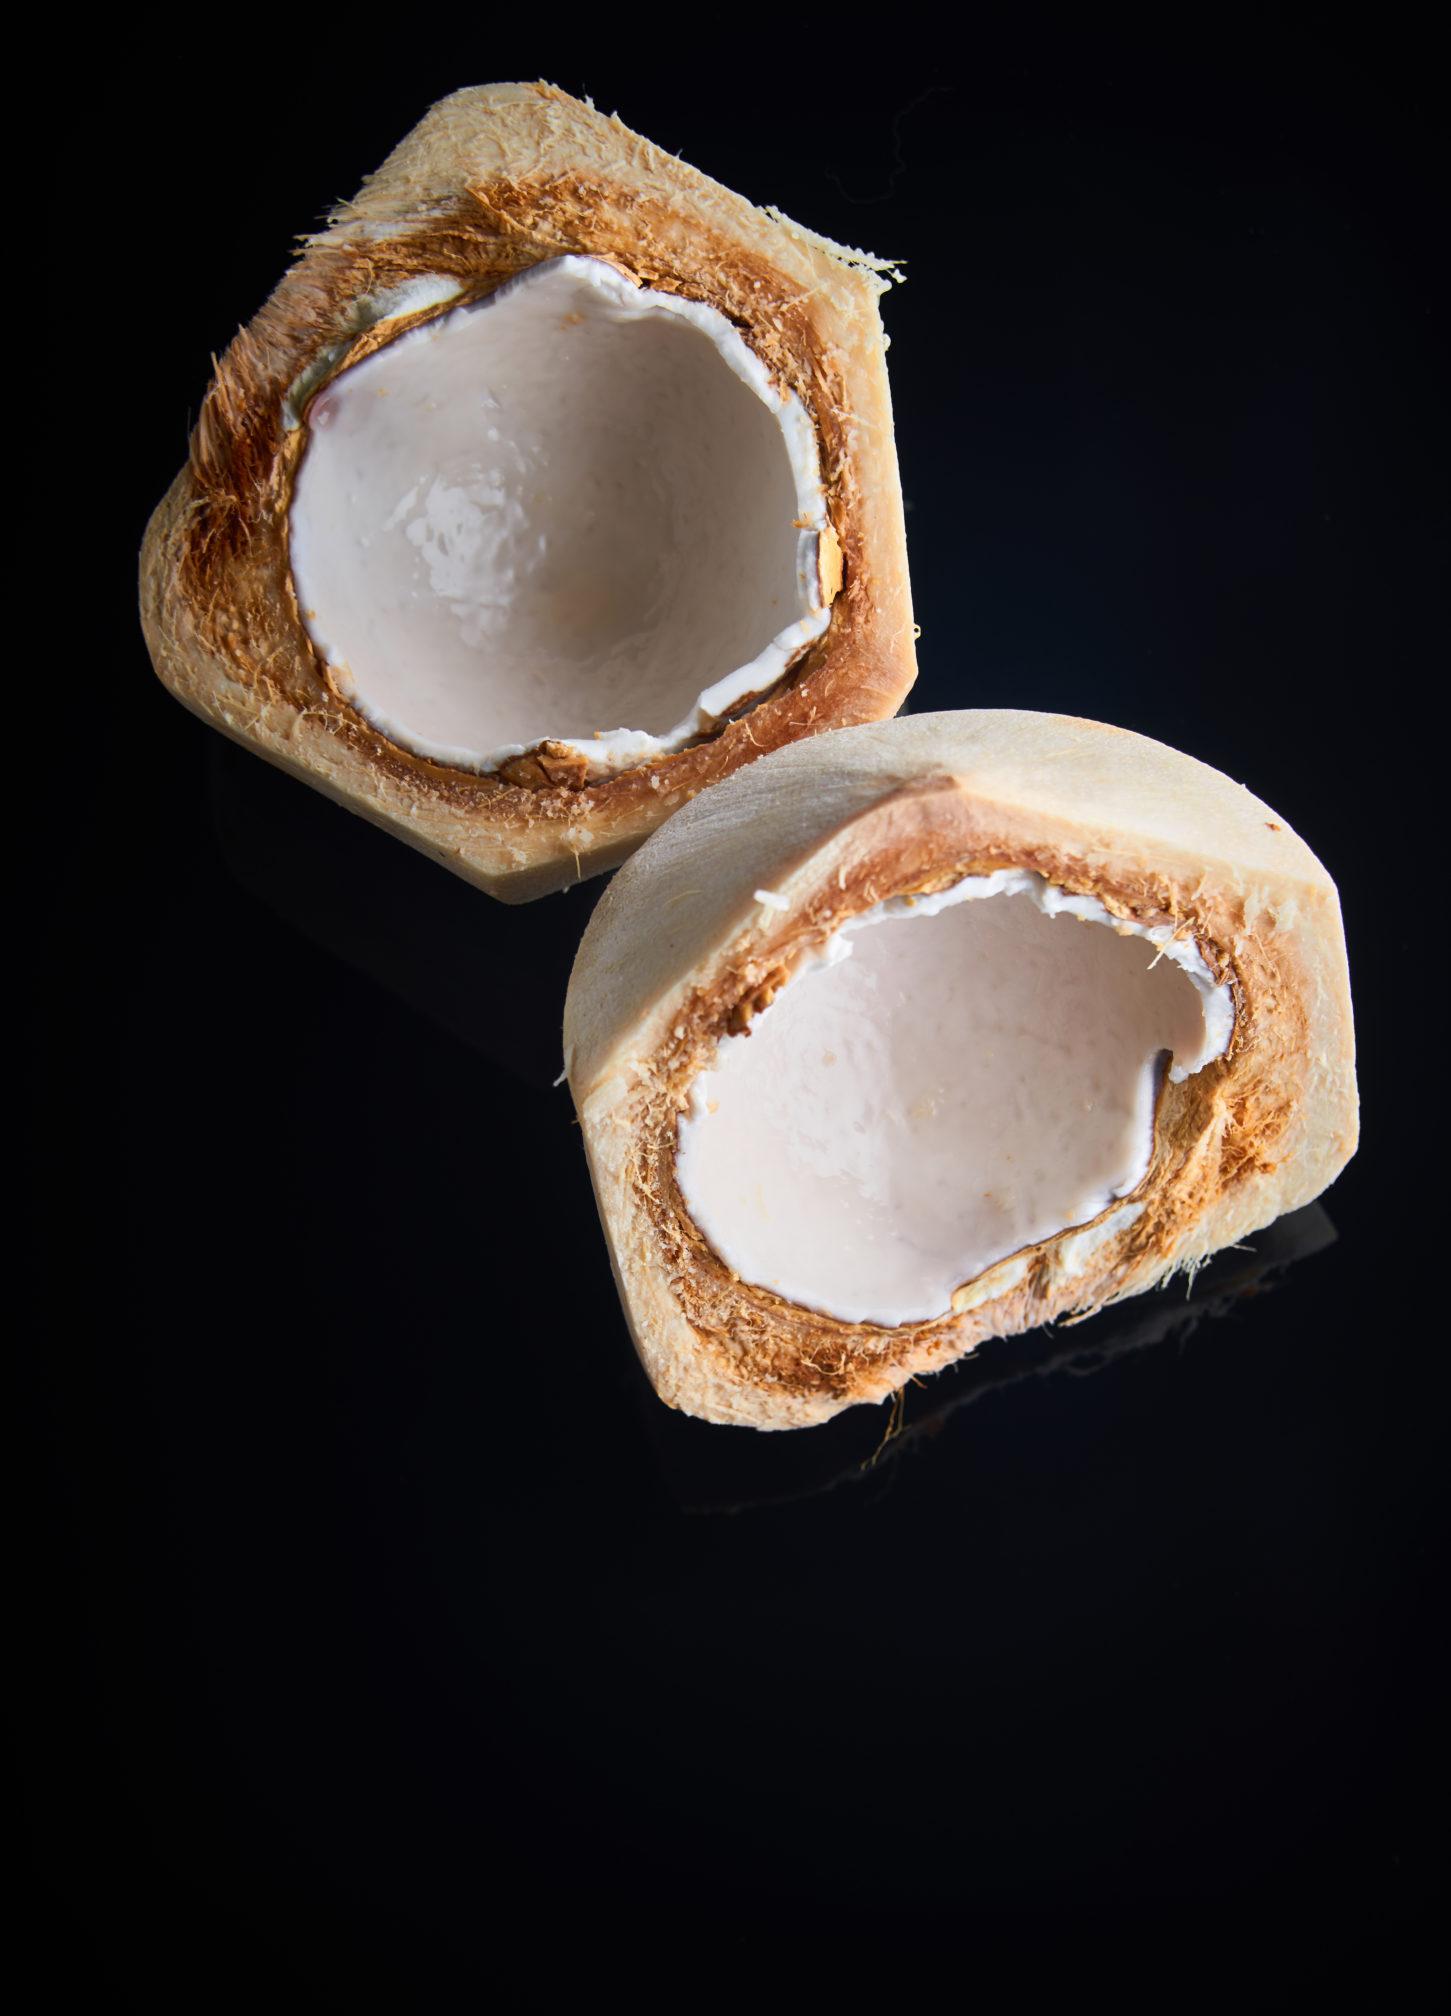 capexo-lilot-fruits-exotique-coco-vietnam-thailande